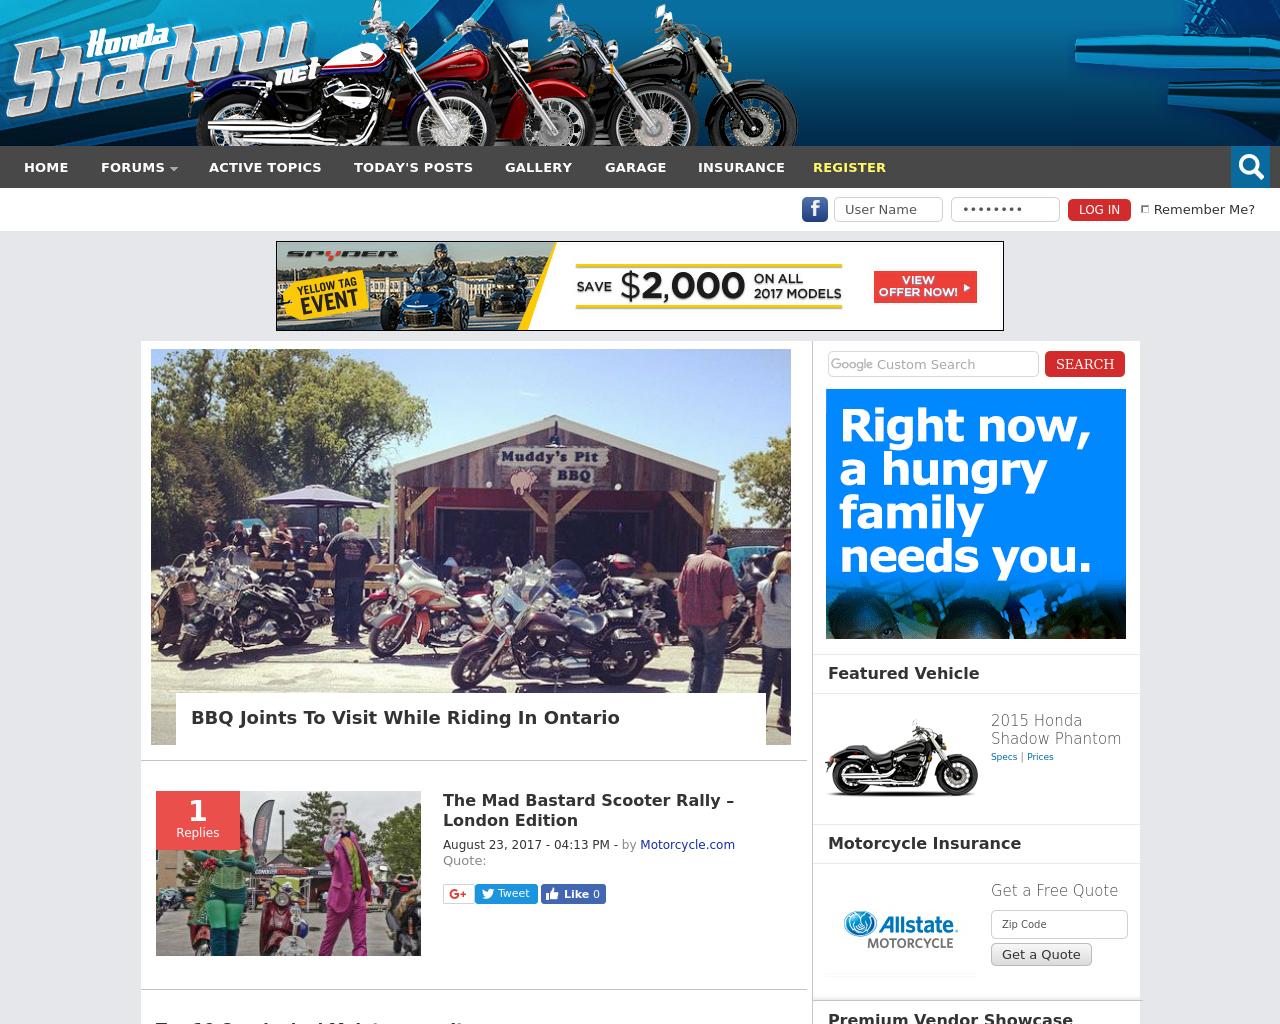 Honda-Shadow-Forums-Advertising-Reviews-Pricing